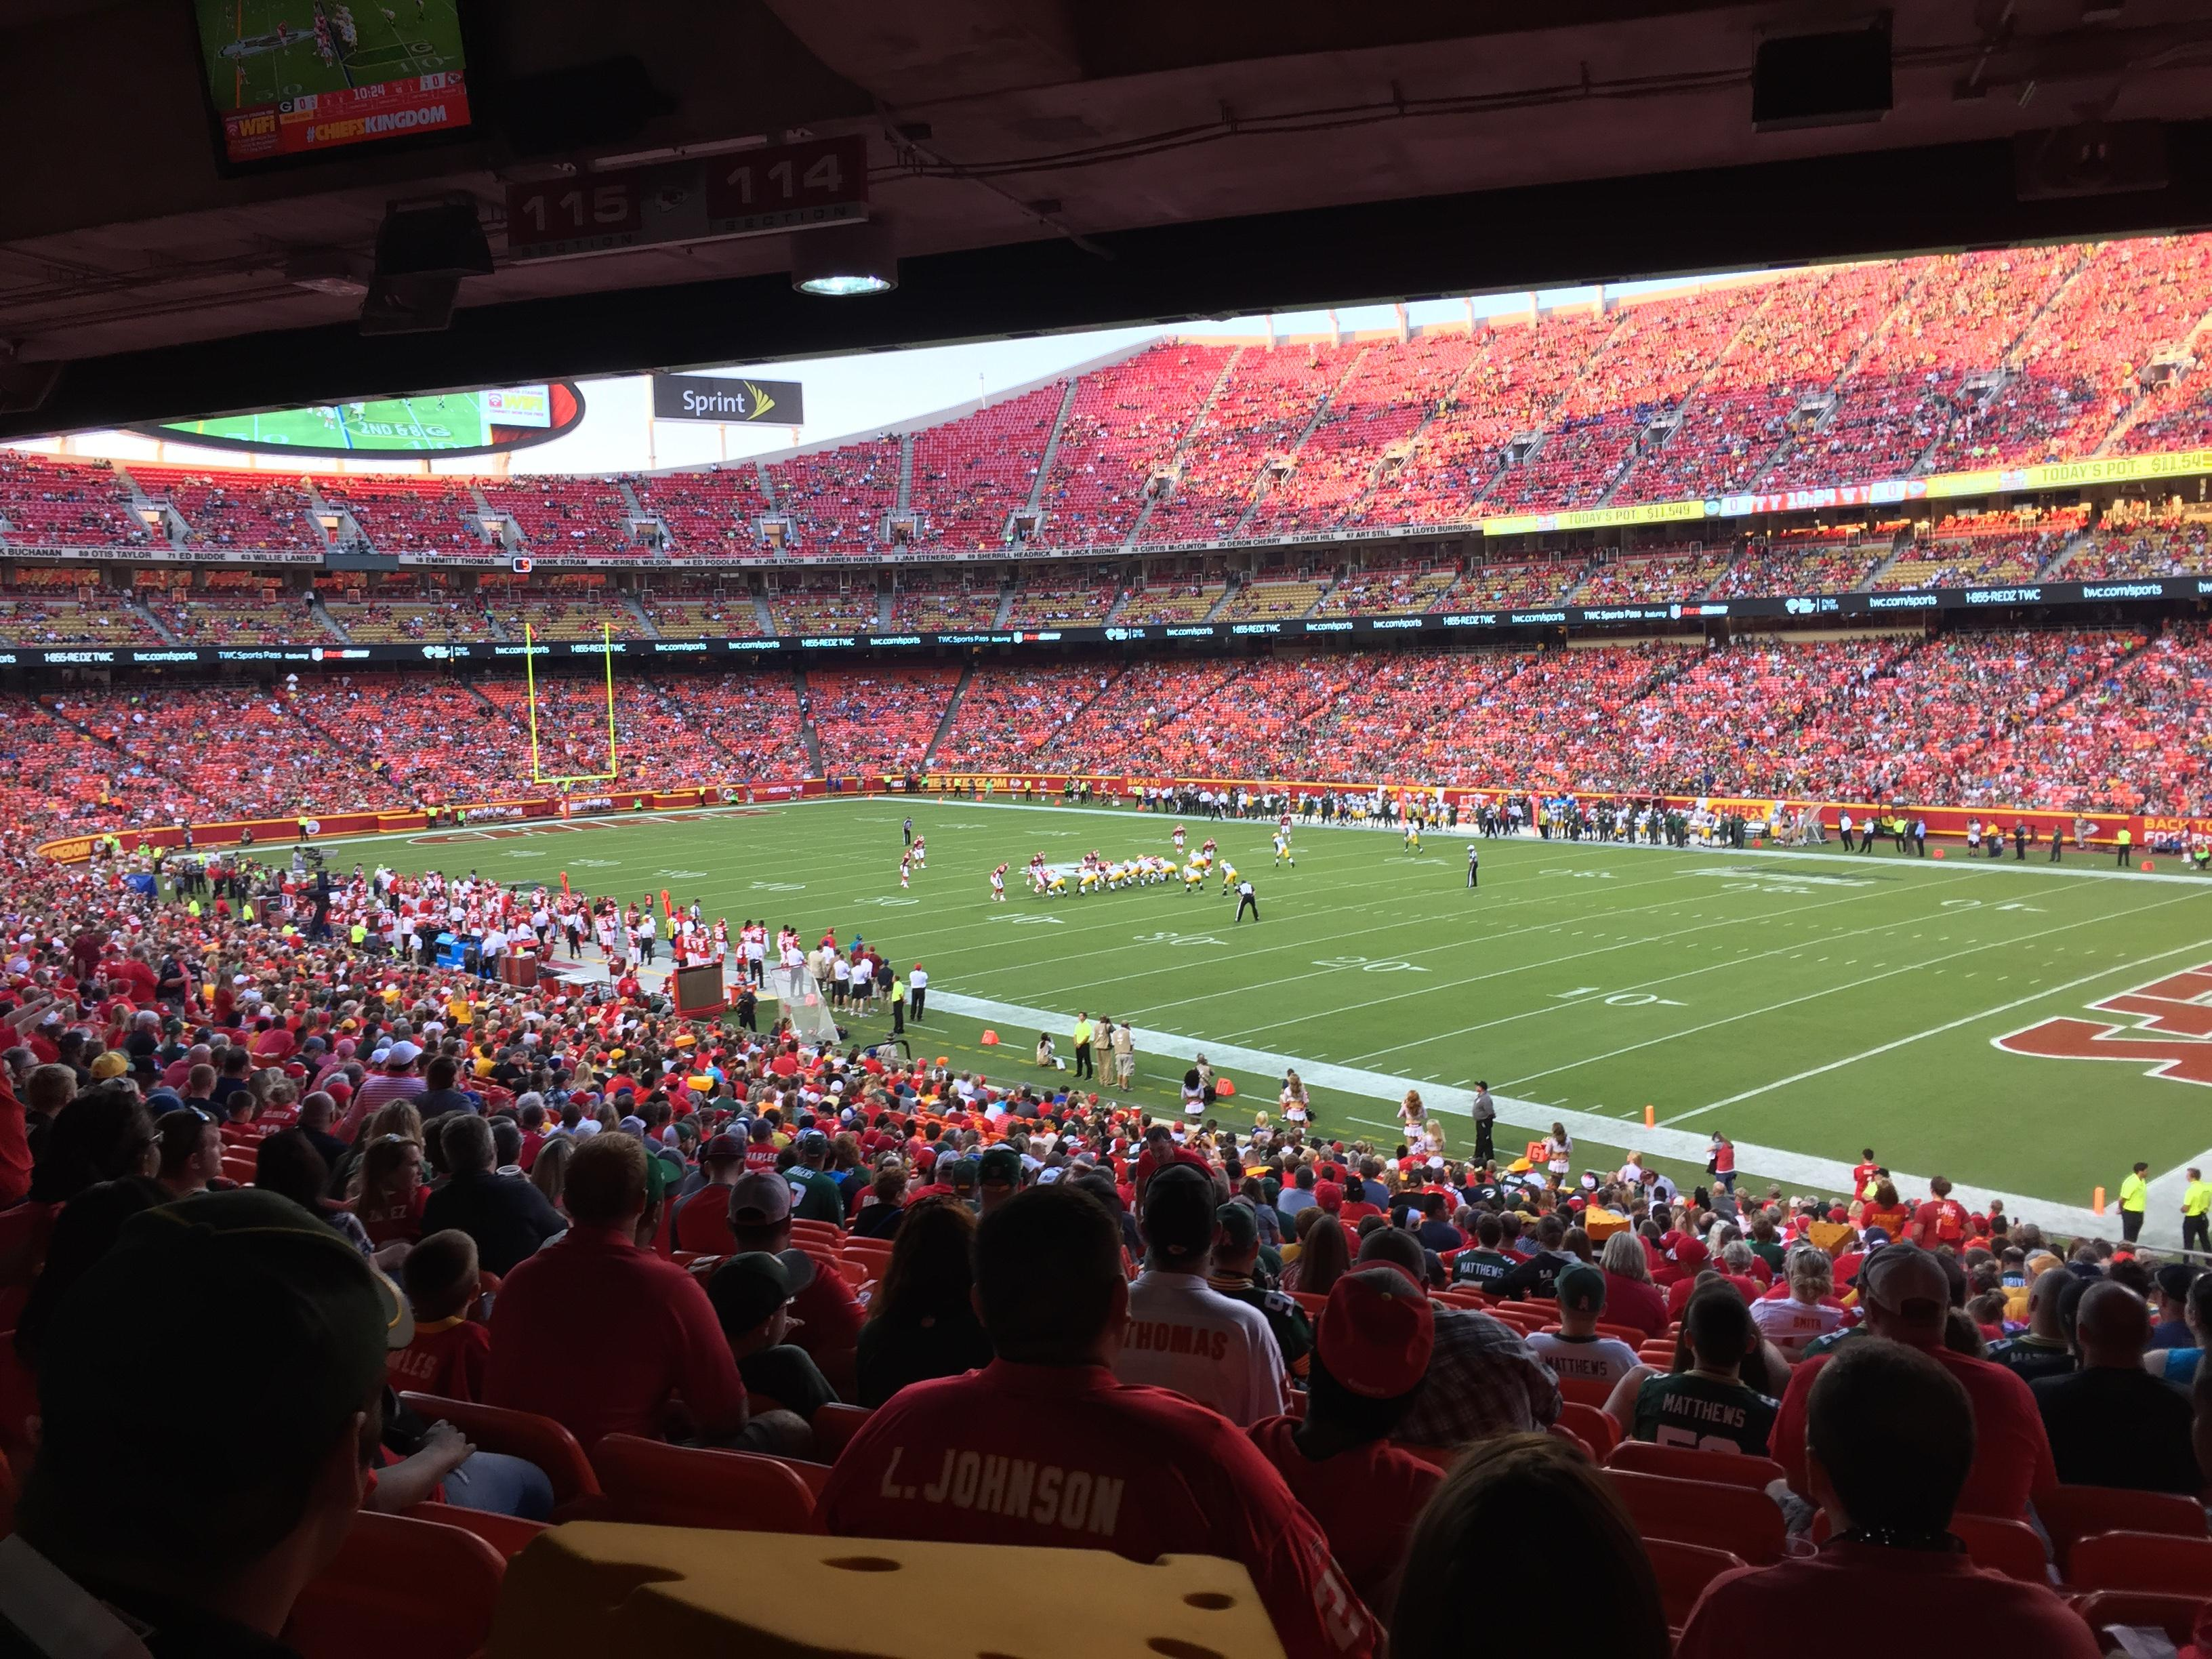 Arrowhead Stadium Section 114 Row 38 Seat 23